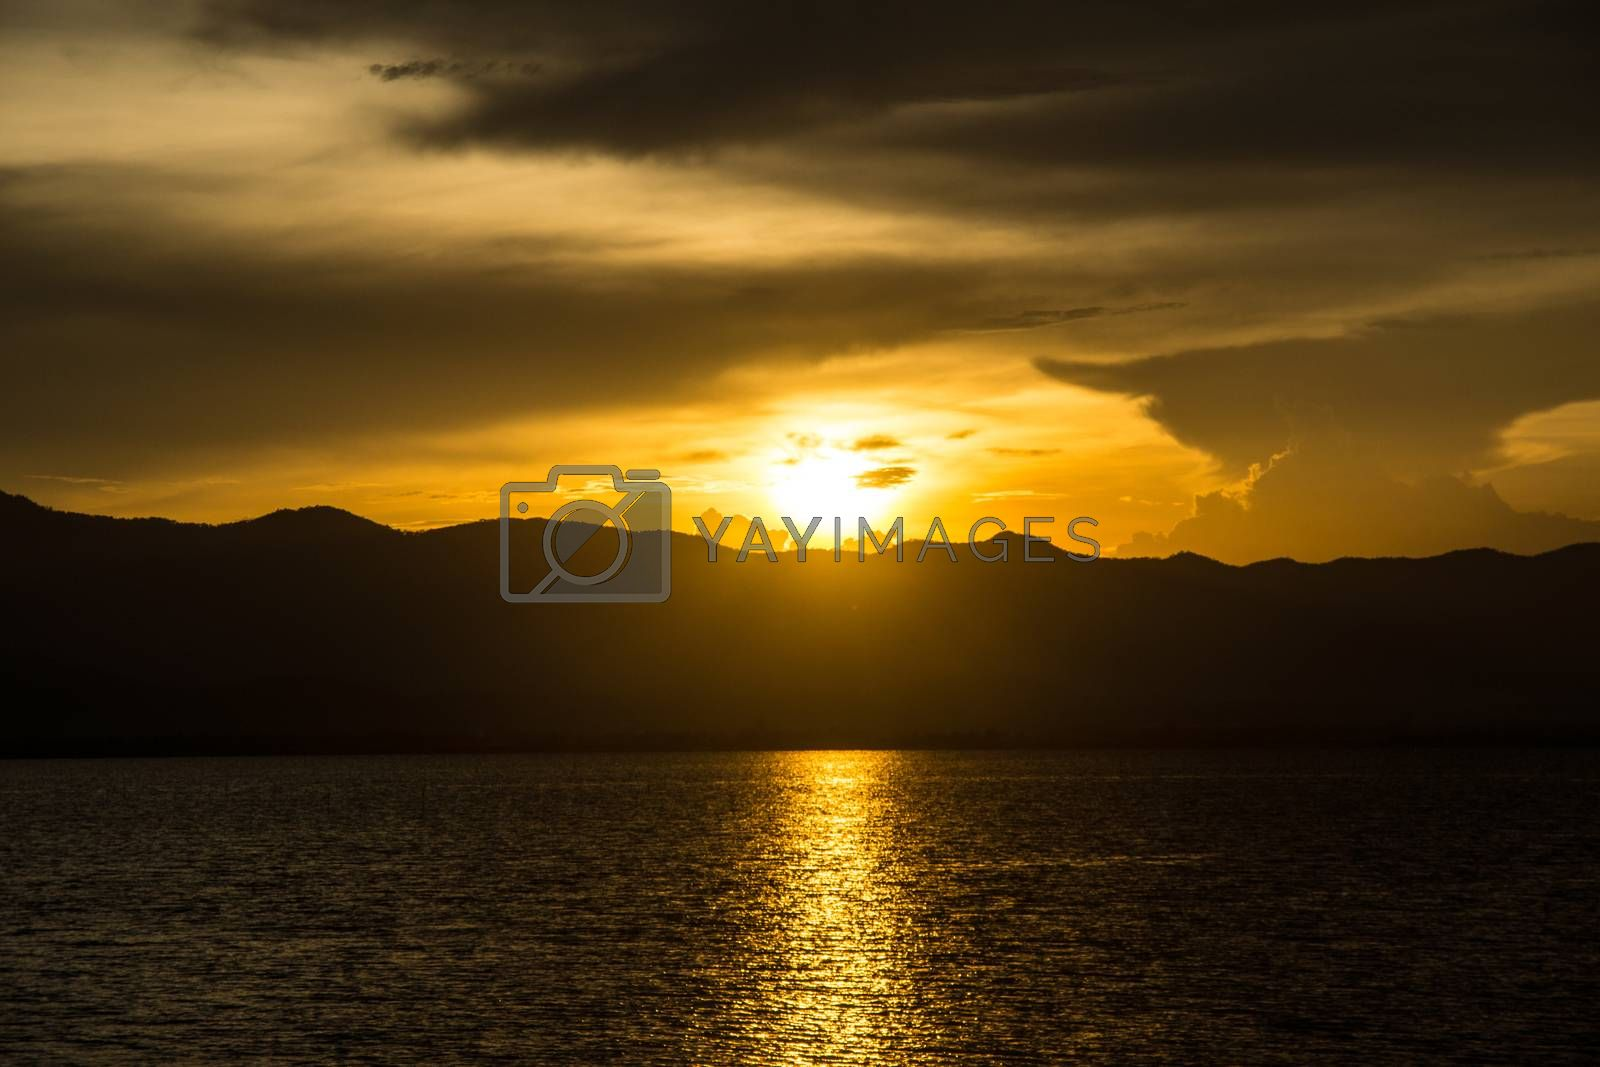 Royalty free image of sunset scene by nattapatt